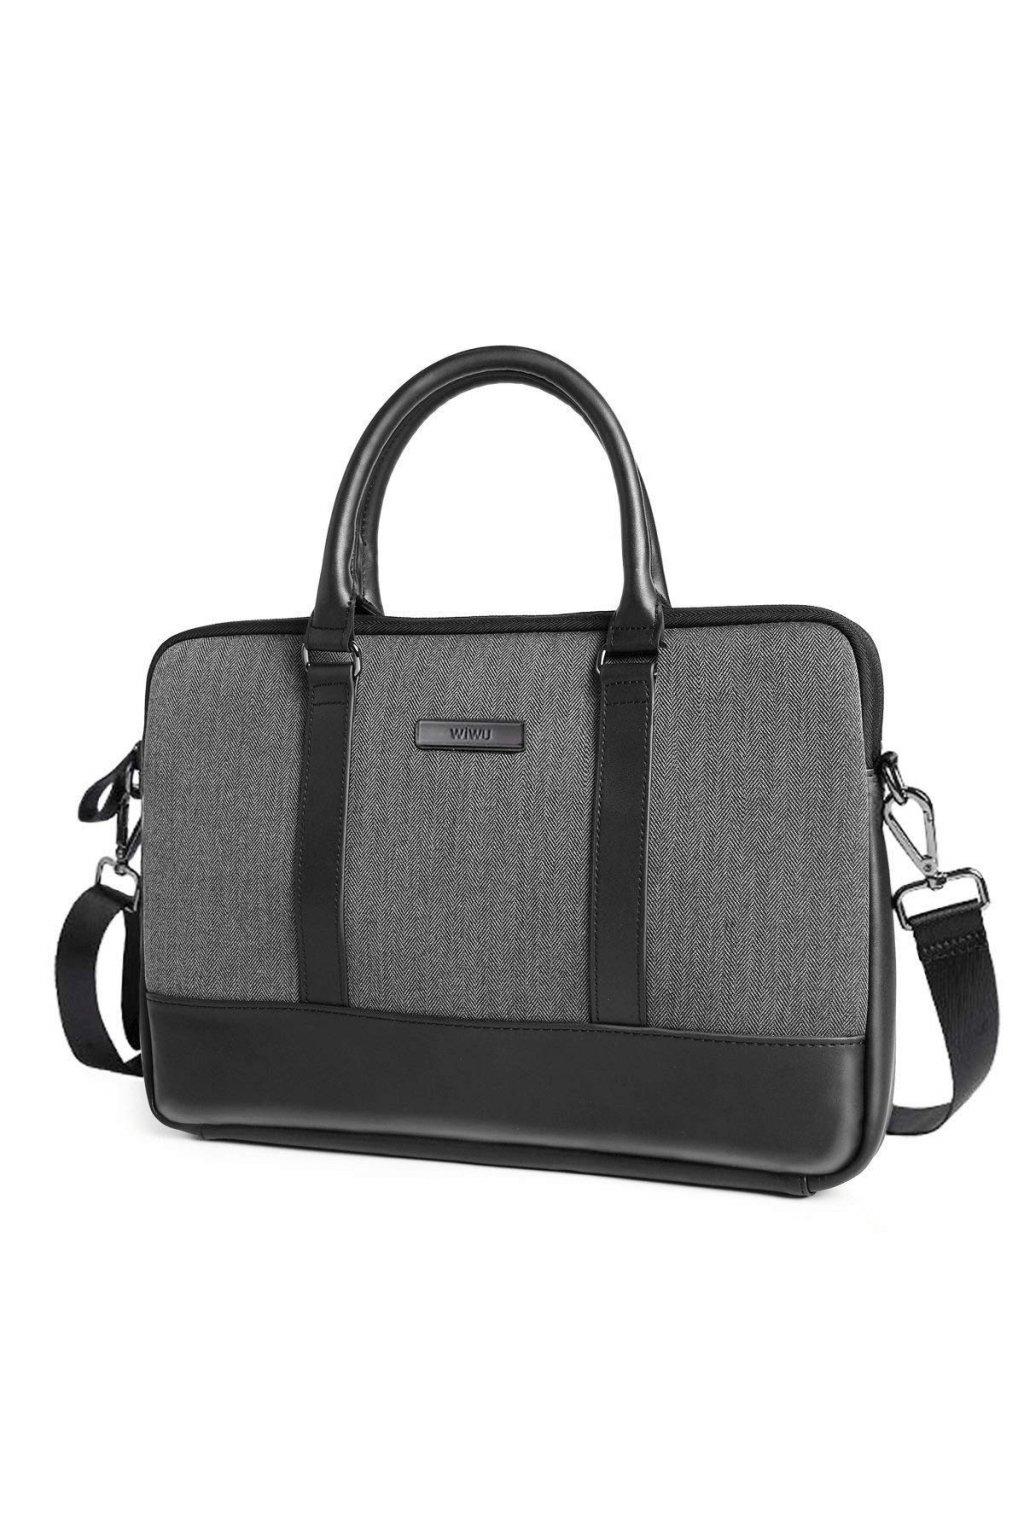 "WiWU London Briefcase Taška na notebook 13,3"""